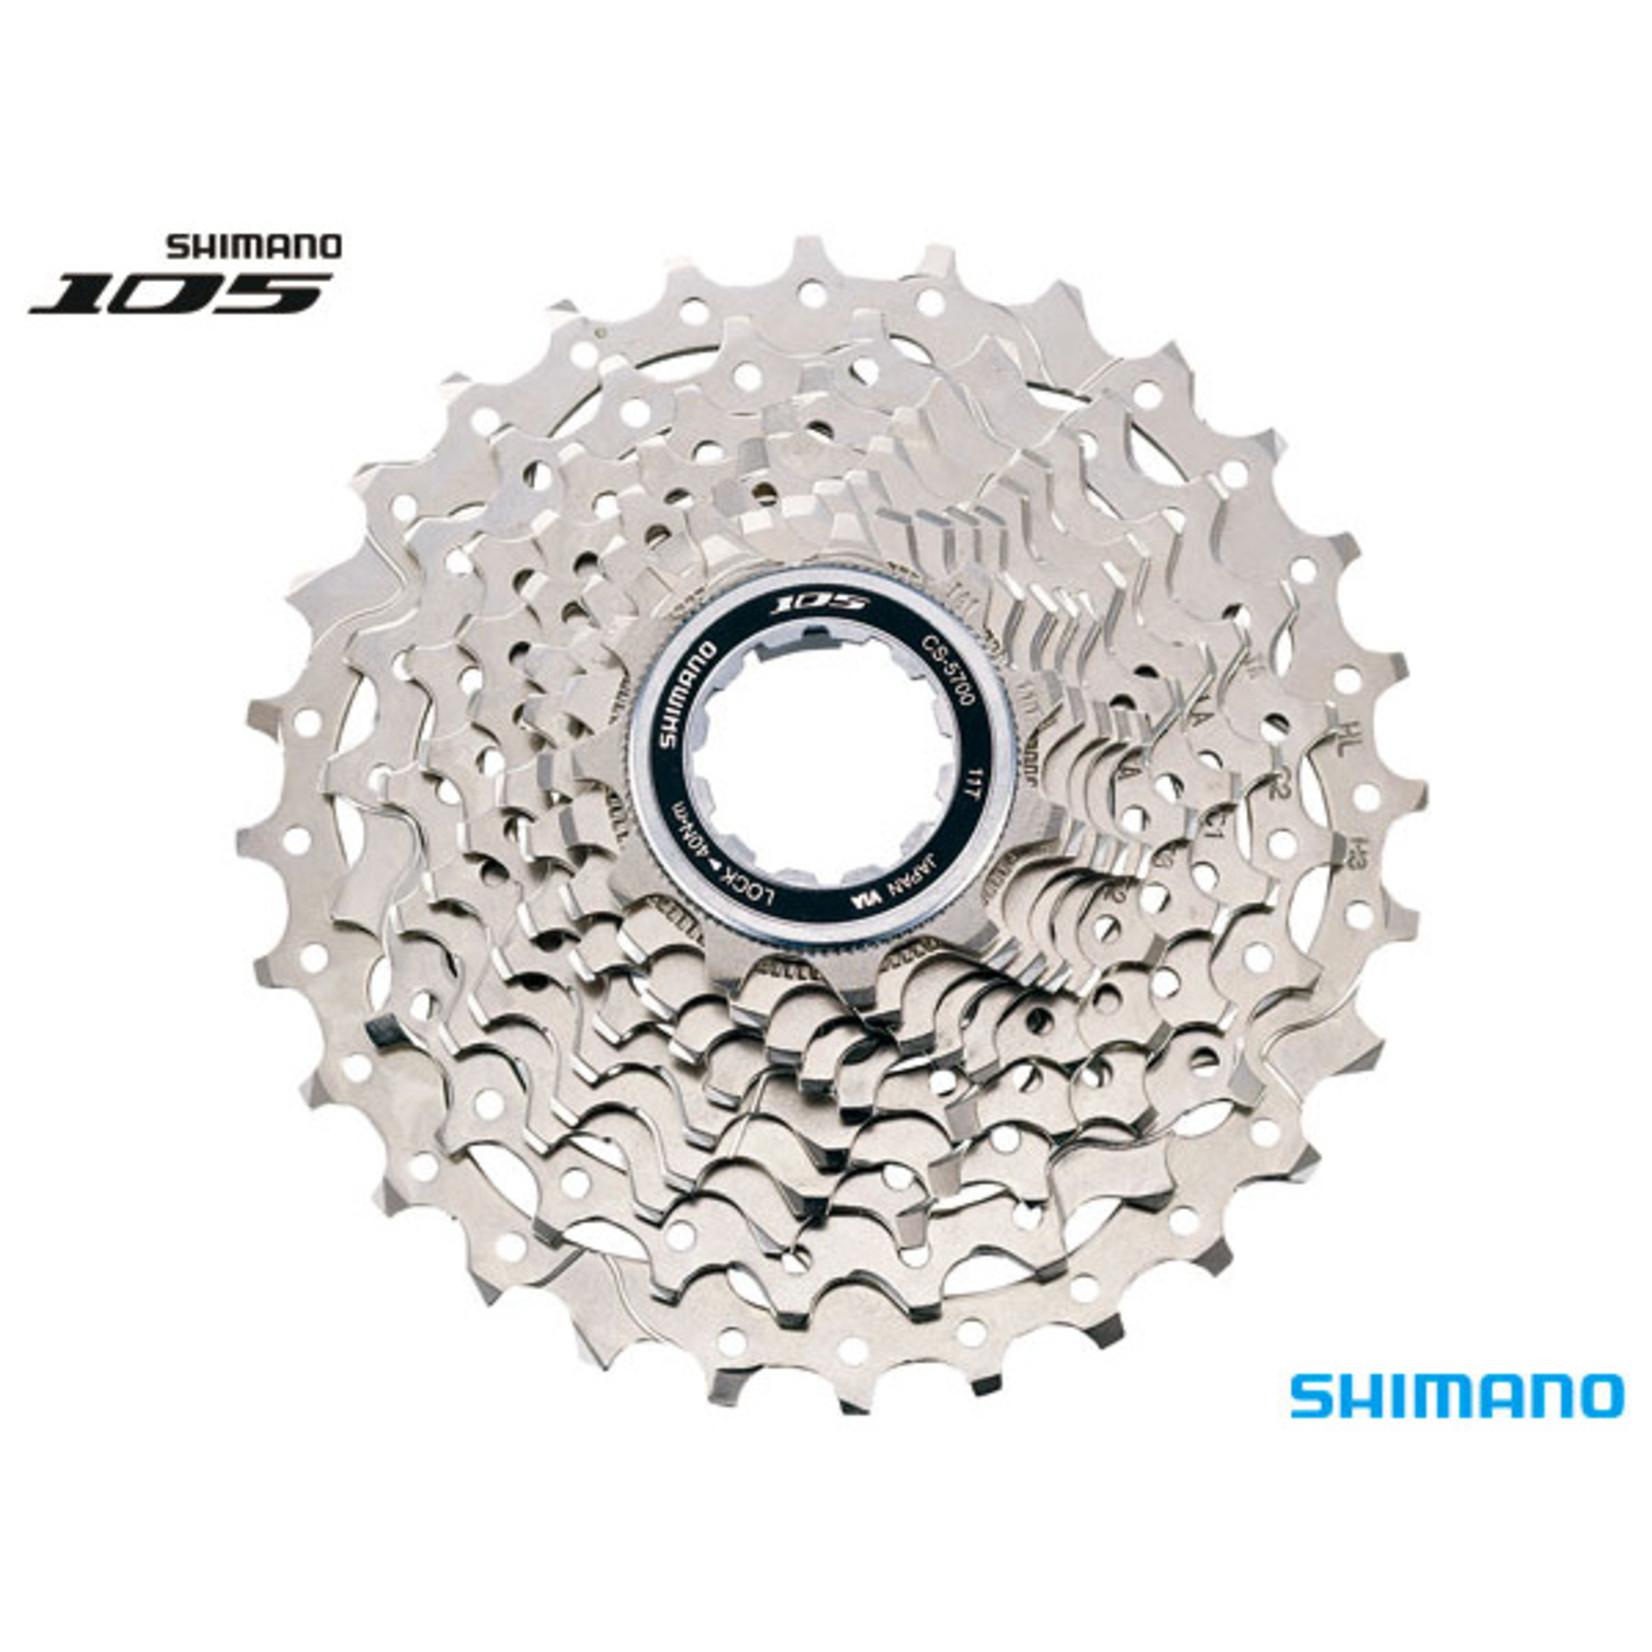 Shimano Shimano, CS-5700 Cassette 10-Speed 105